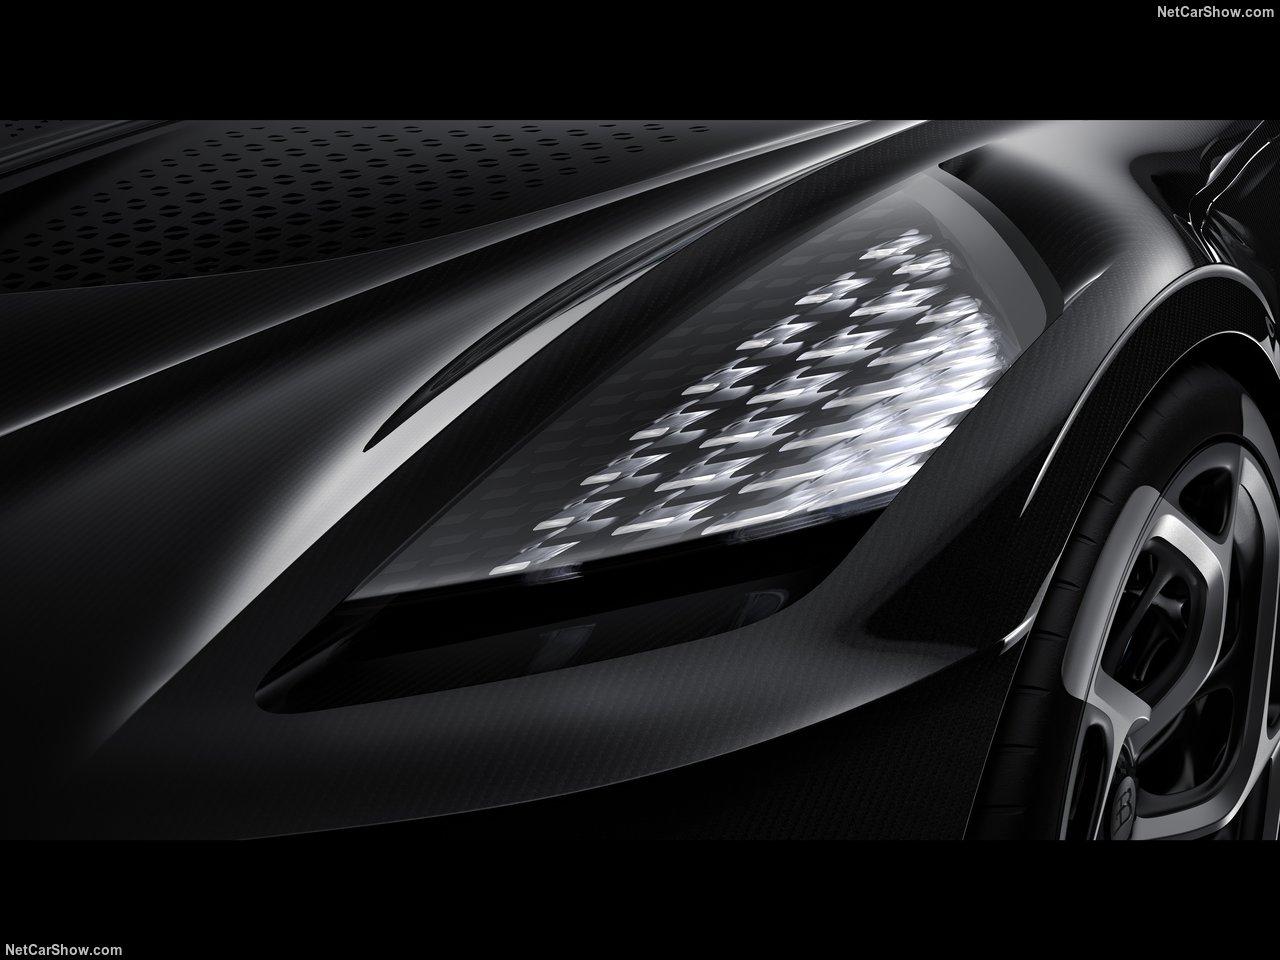 Bugatti La Voiture Noir, o carro novo mais caro de sempre que custa 11 milhões de euros